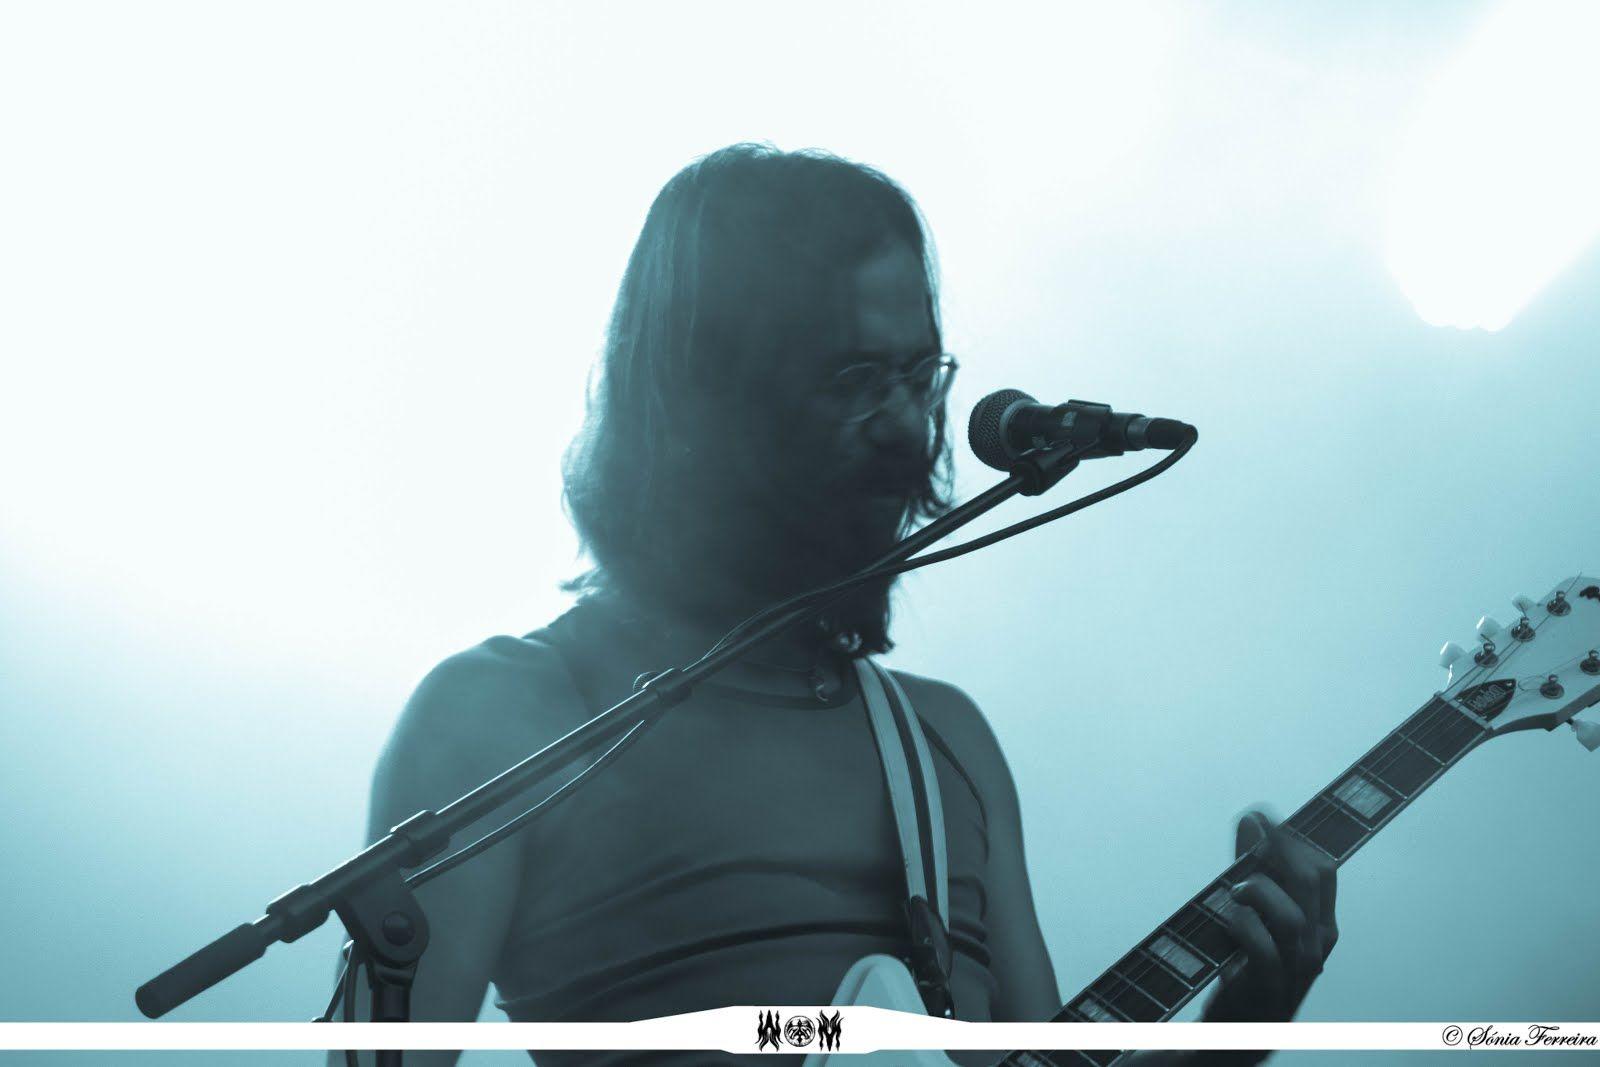 Fotorreportagem The Quartet Of Woah! @ Reverence Valada, 10/09/16 - Parque das Merendas, Valada - World Of Metal